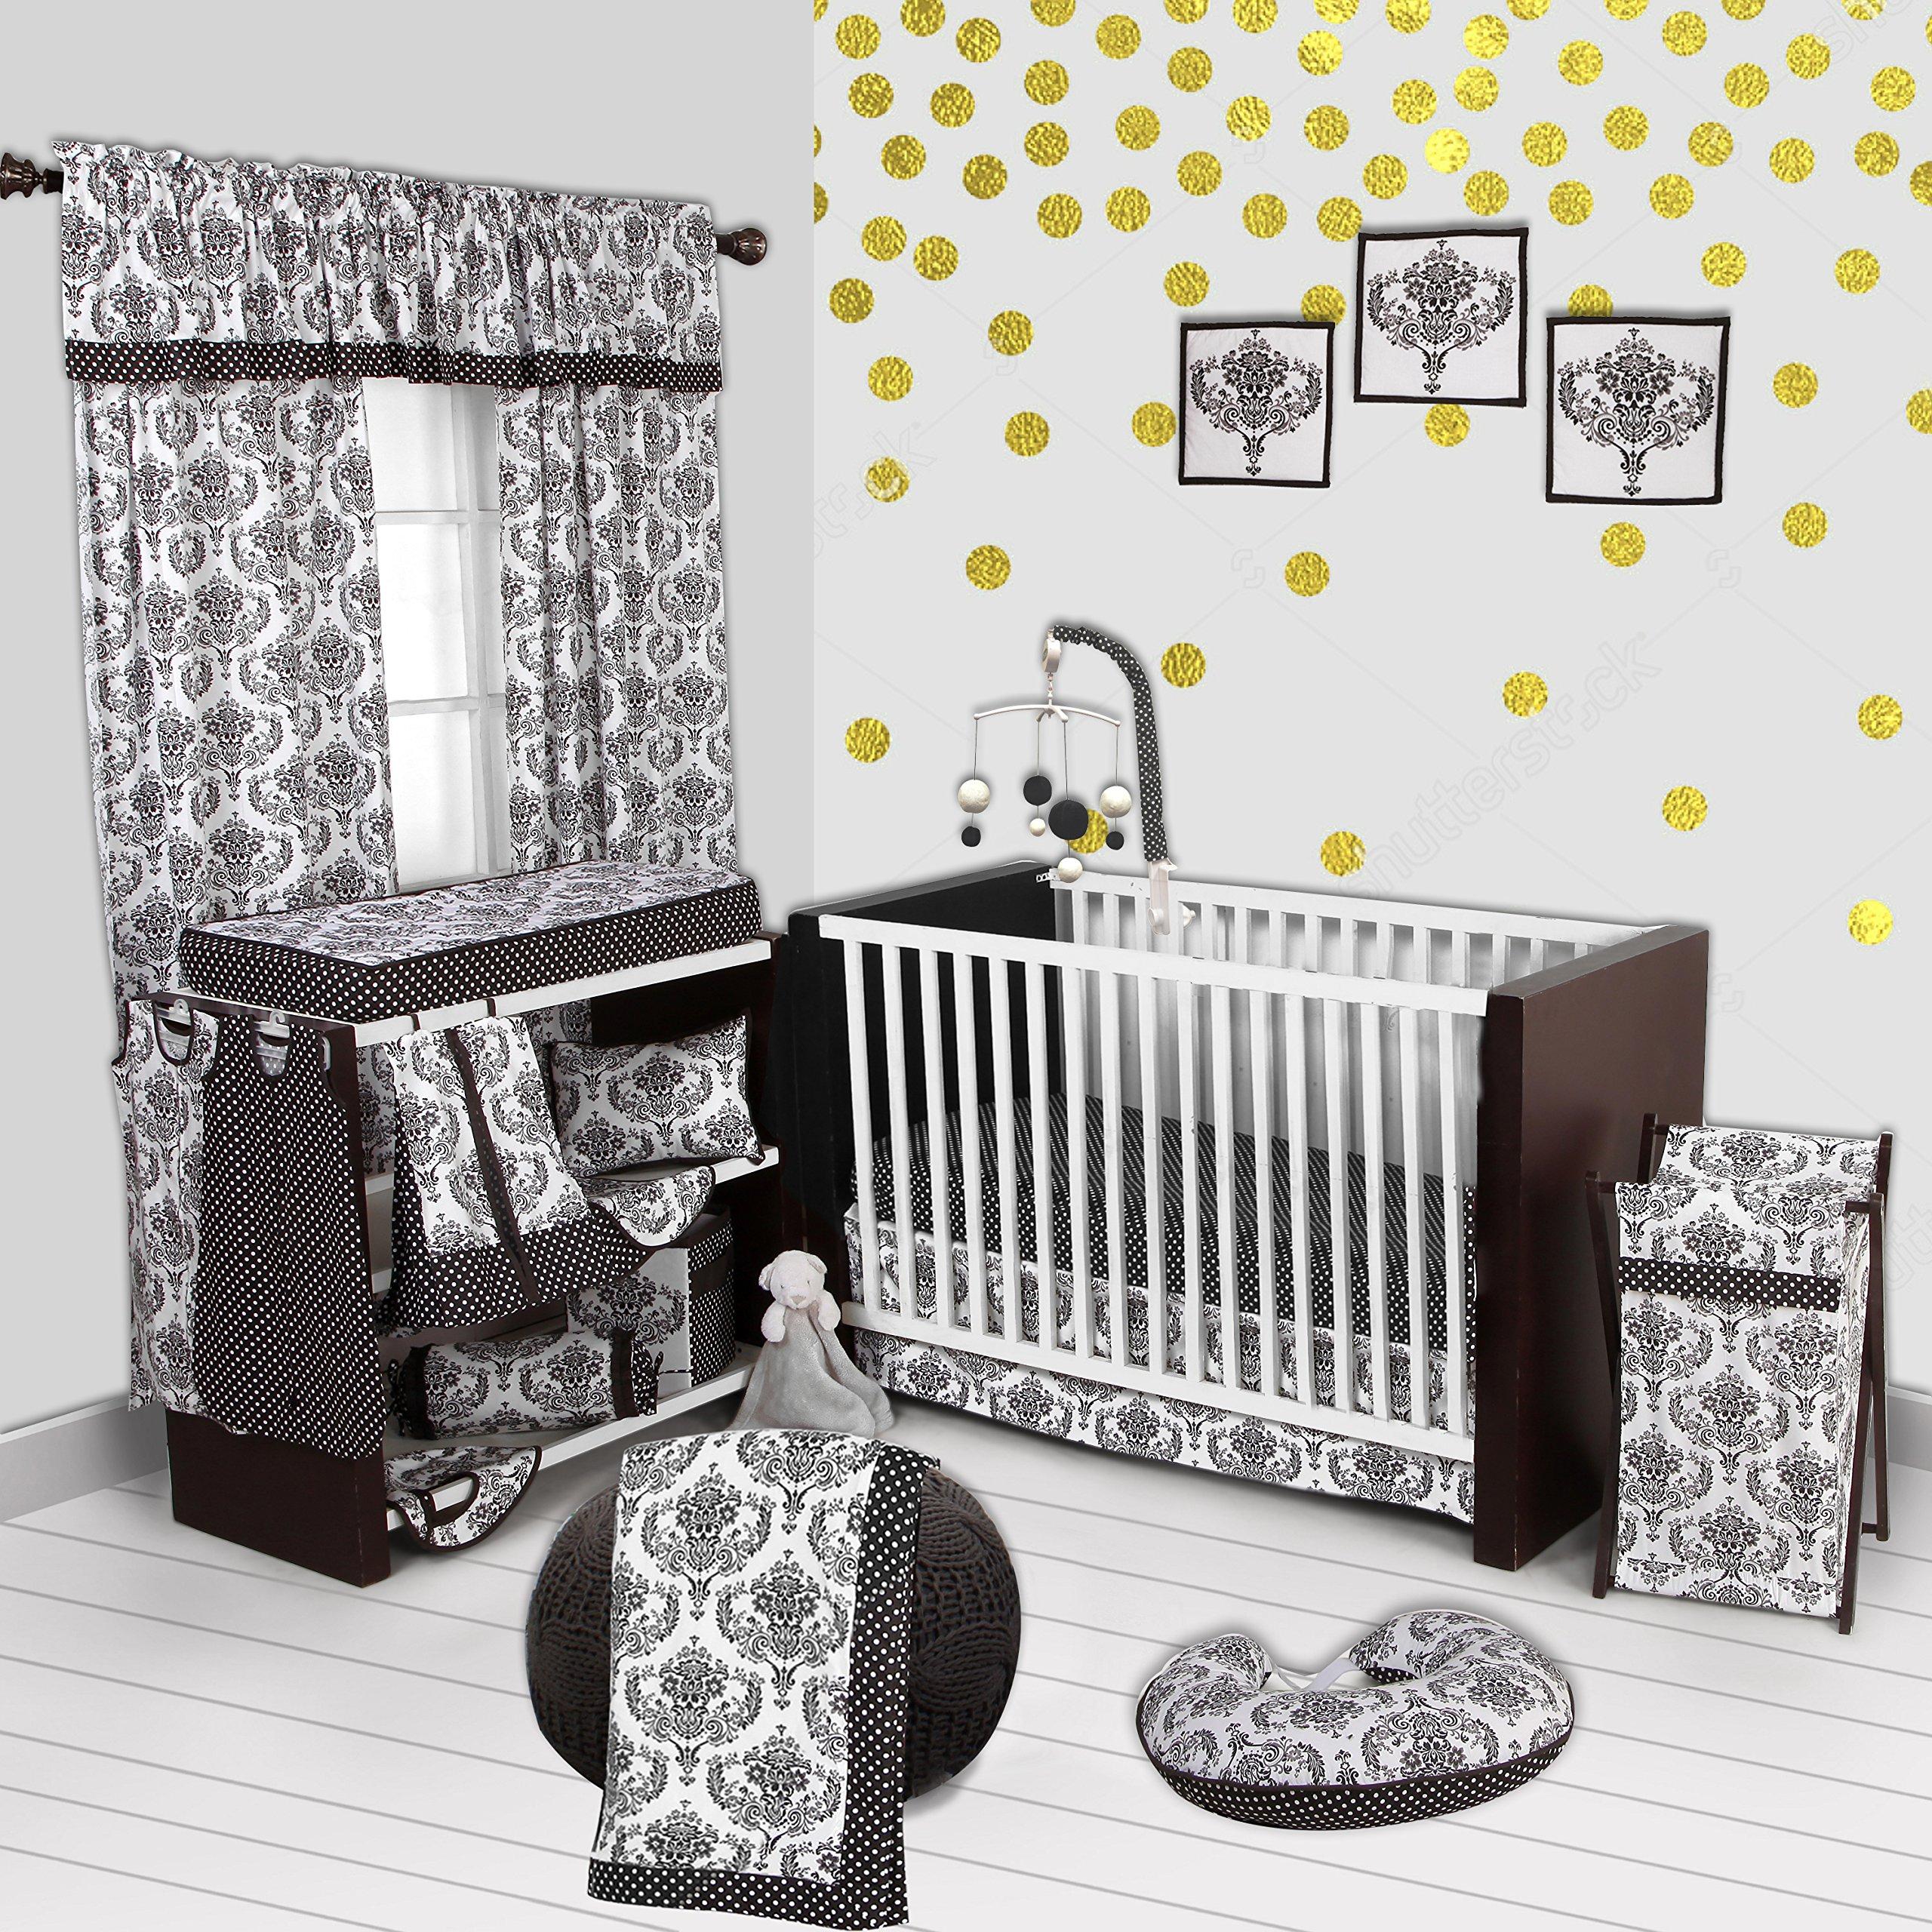 Bacati - Classic Damask White/black 10 Pc Crib Set Bumperfree